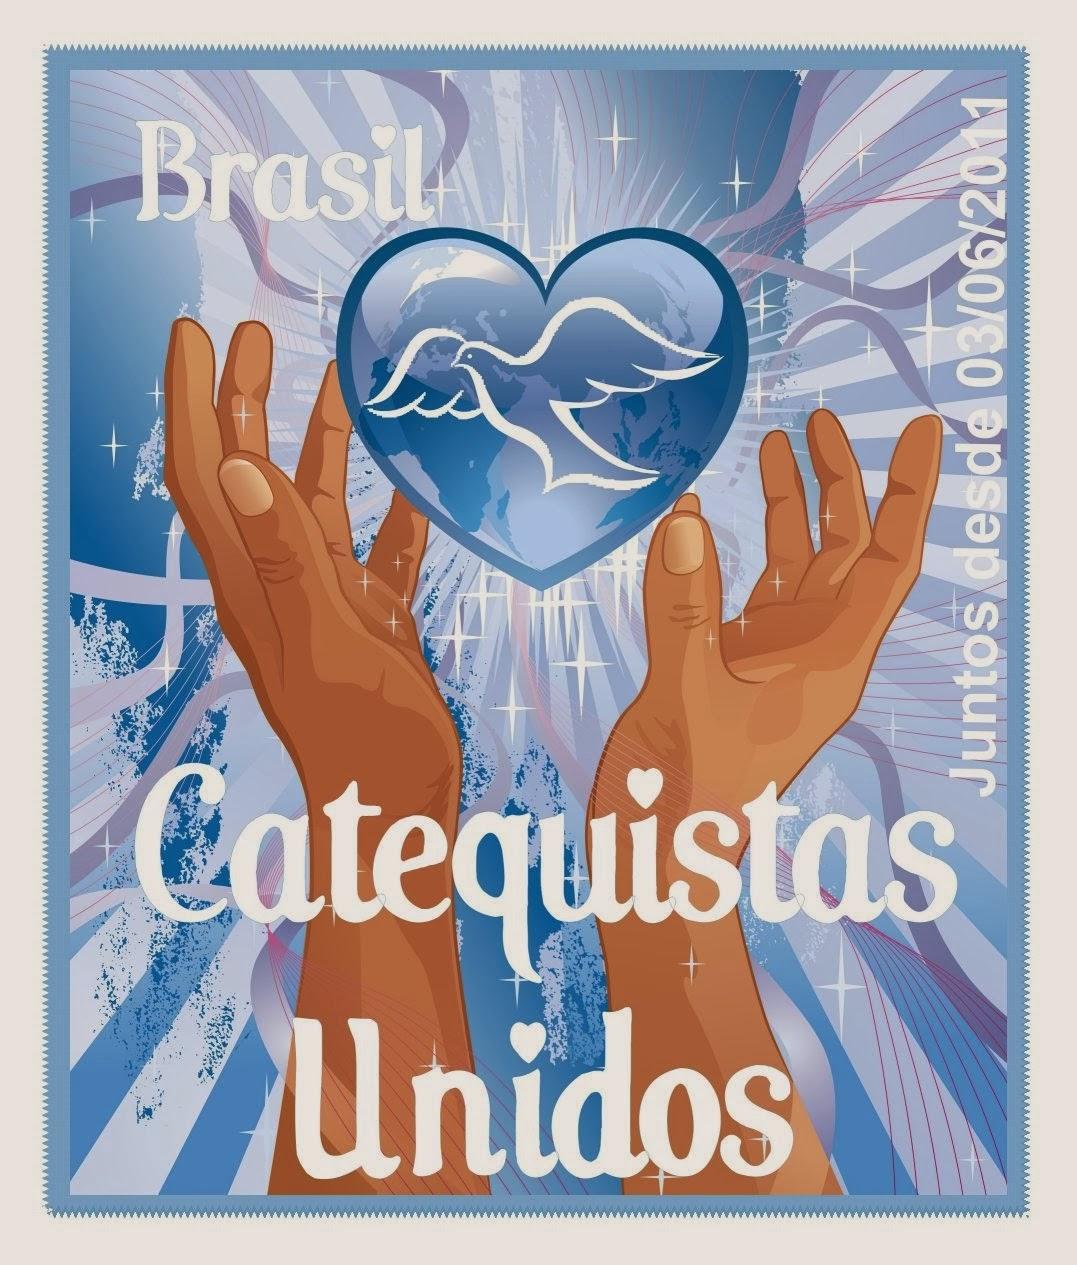 Somos Catequistas Unidos!